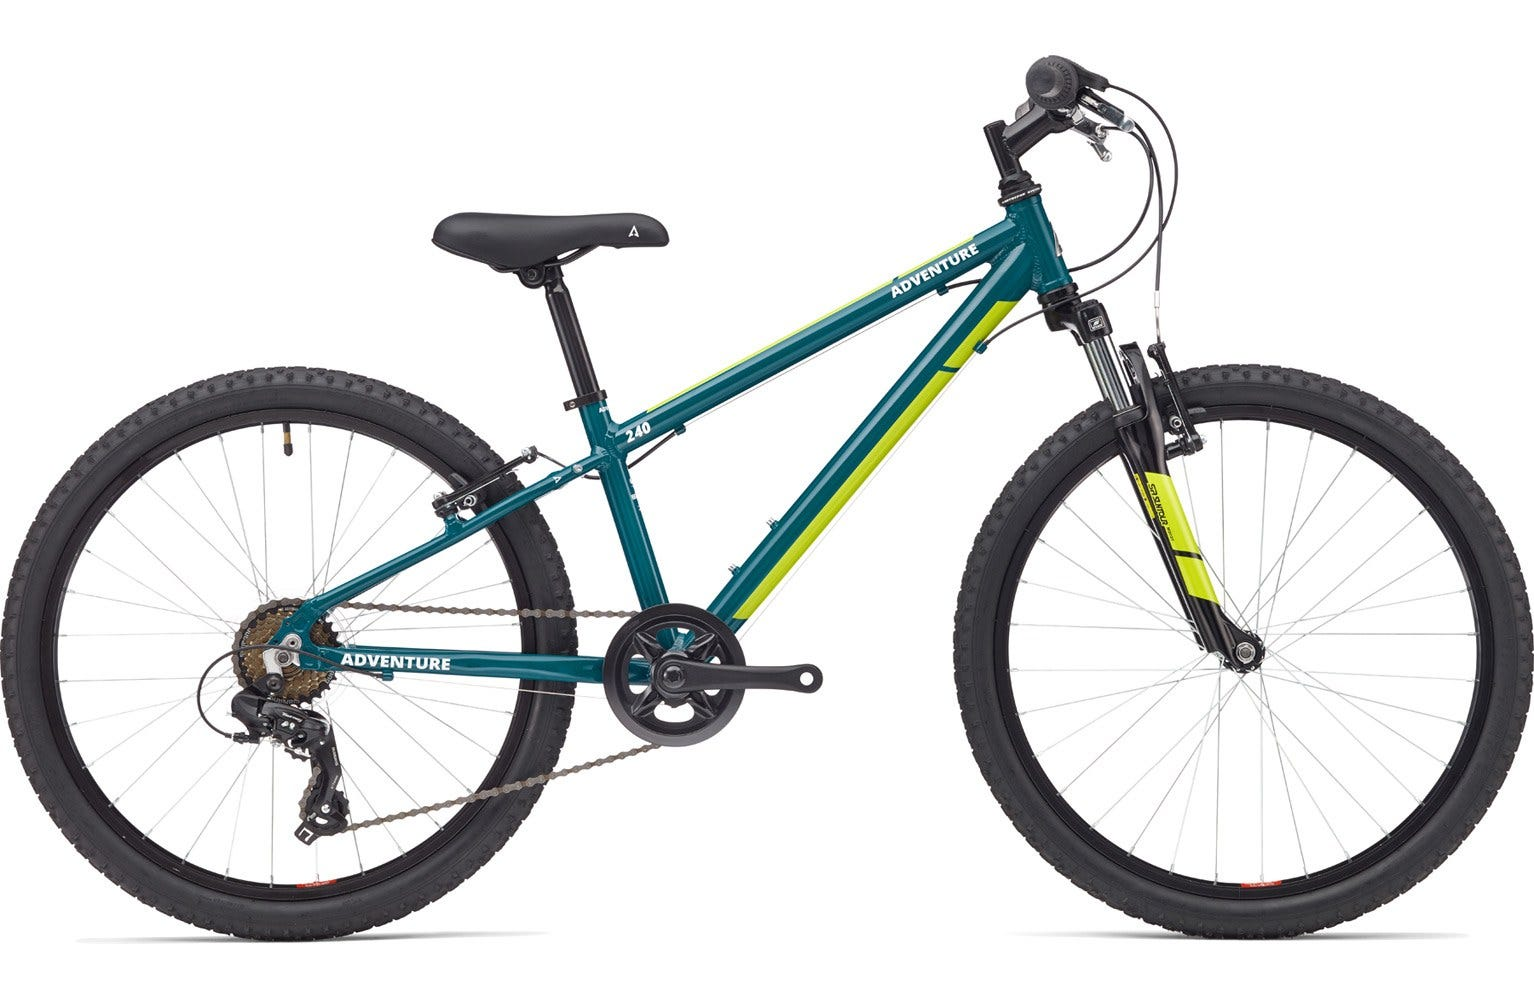 Adventure 240 Green 24 inch